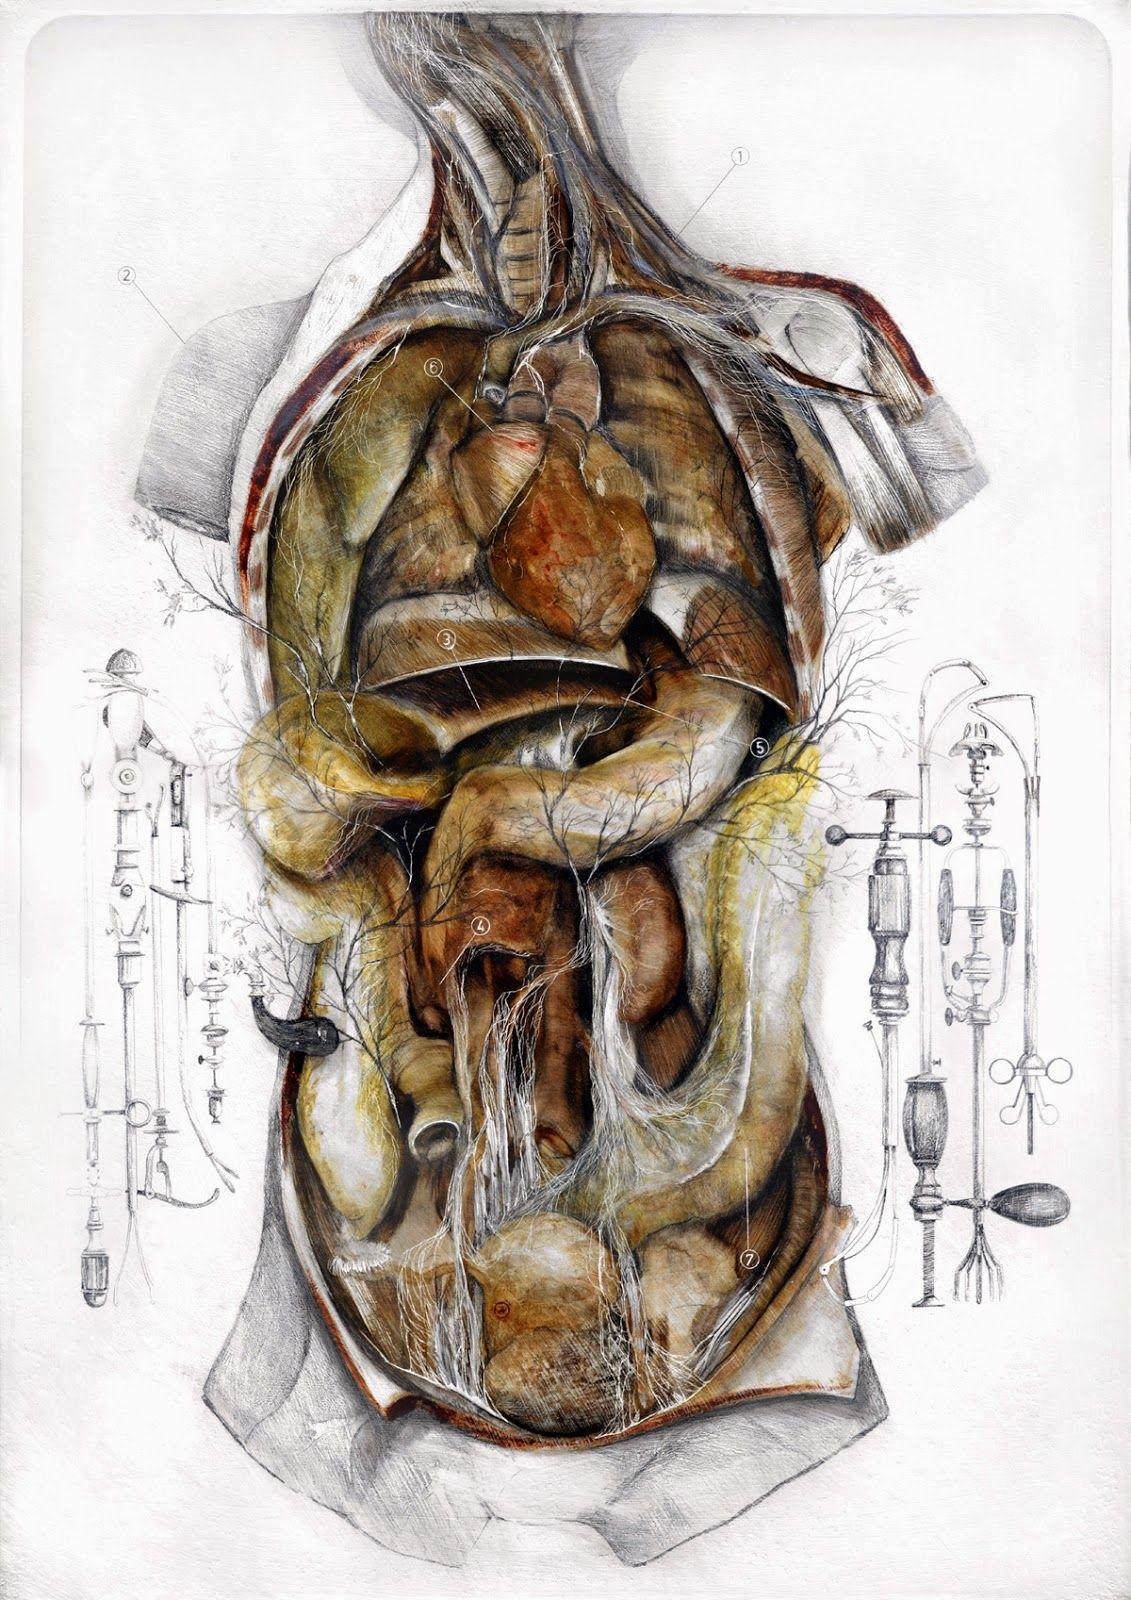 Anatomy of a Shrub || Nunzio Paci | Art and Life | Pinterest